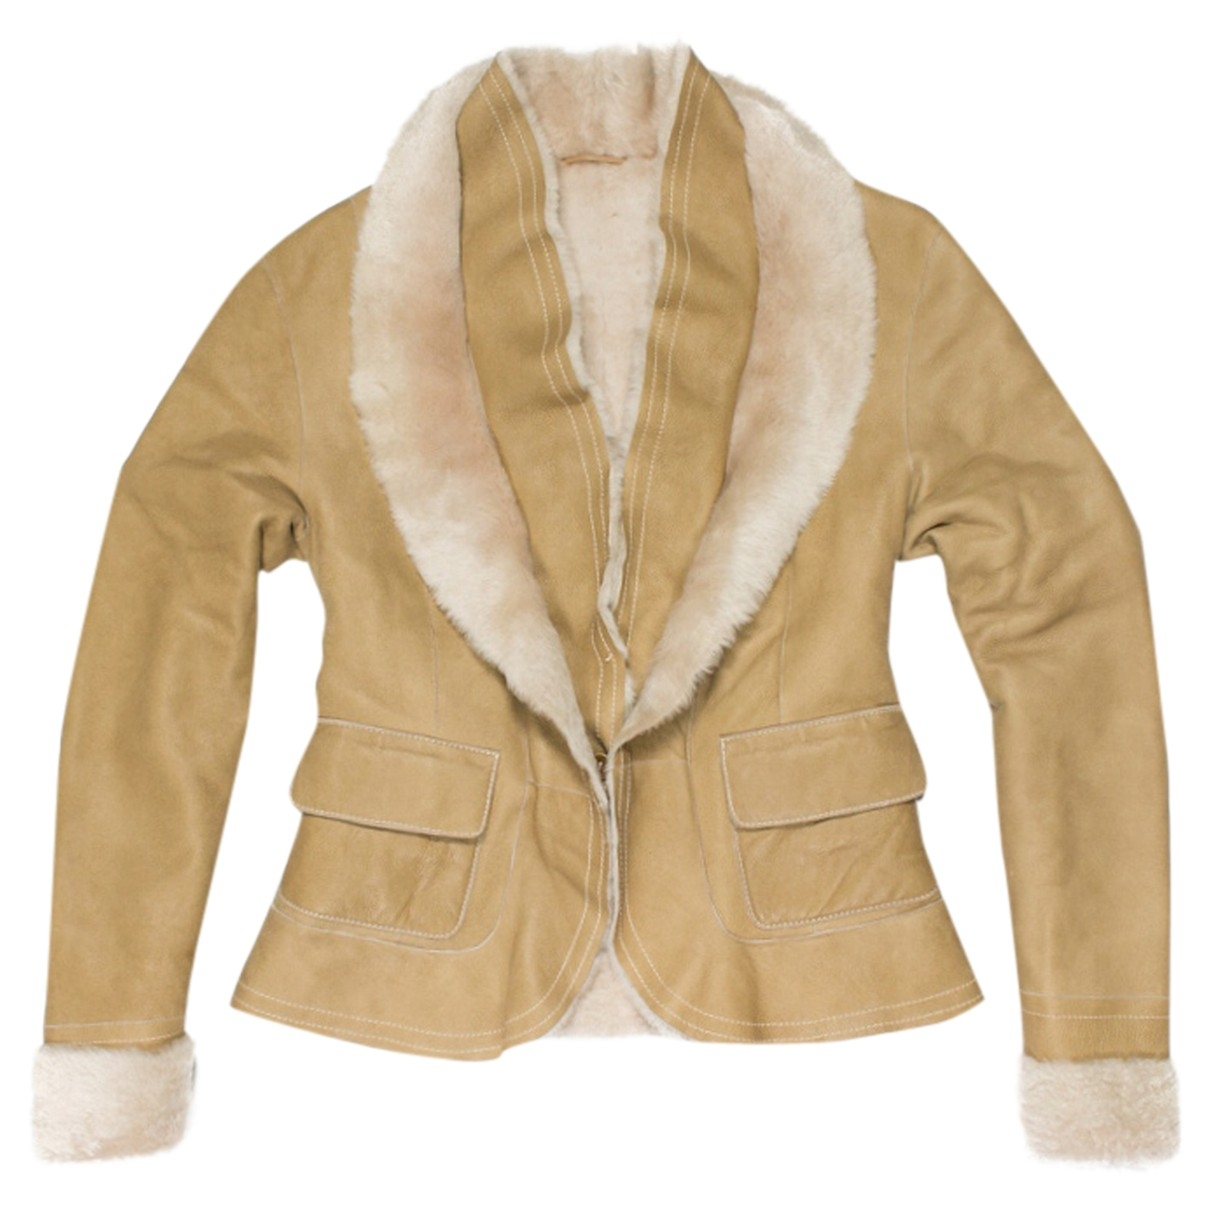 Marc Cain \N Beige Leather jacket for Women M International